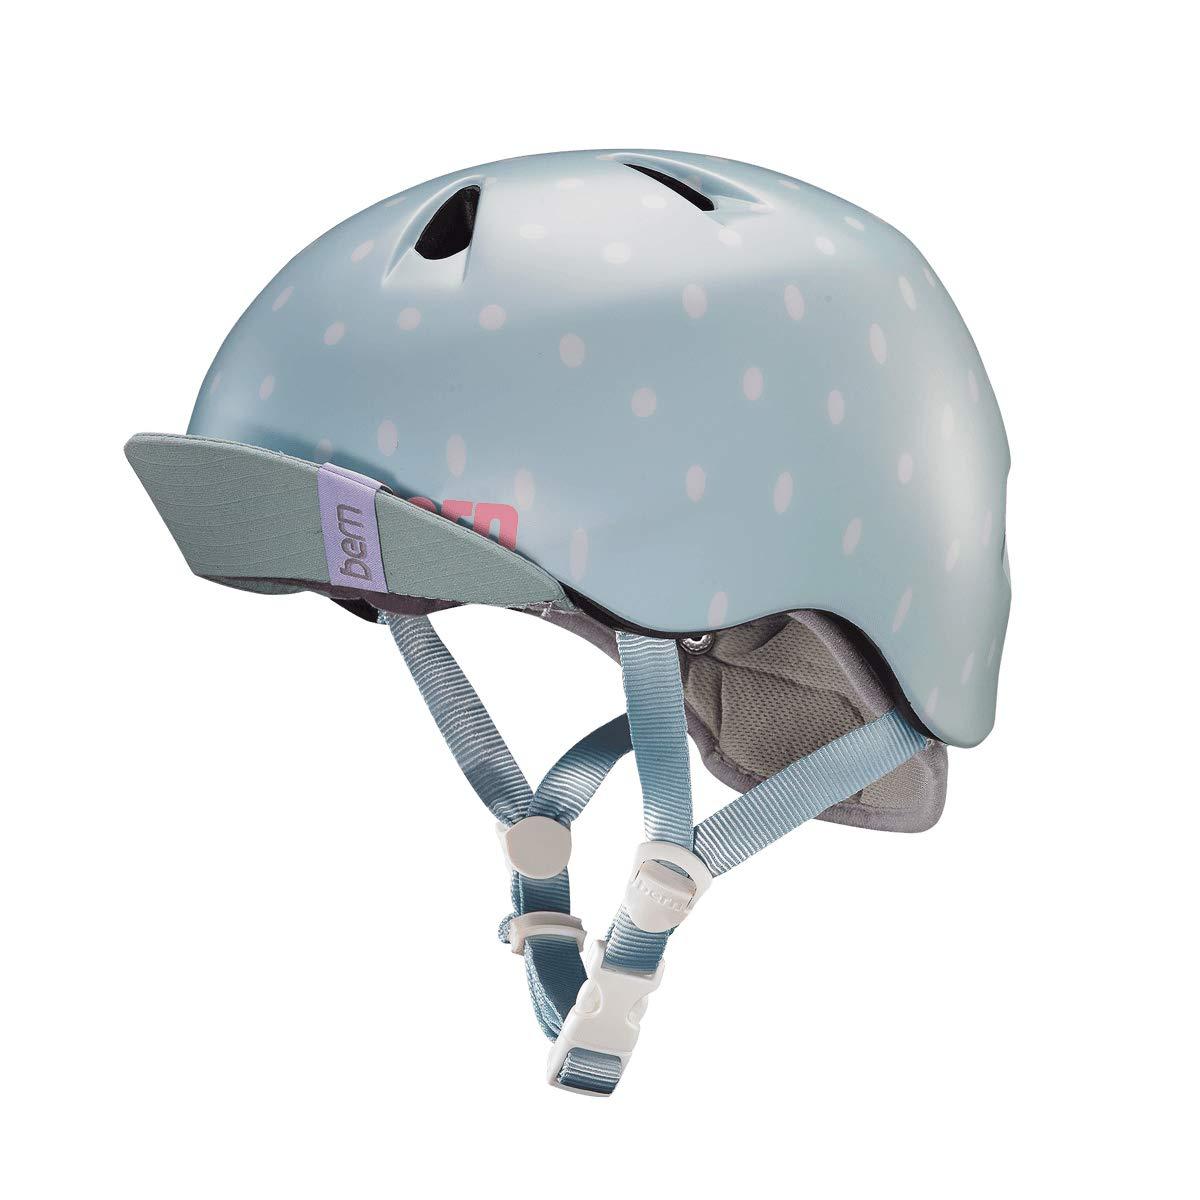 Bern Unlimited Jr. Nina Summer Helmet with Visor (Satin Seaglass Polka Dot, XS/S)